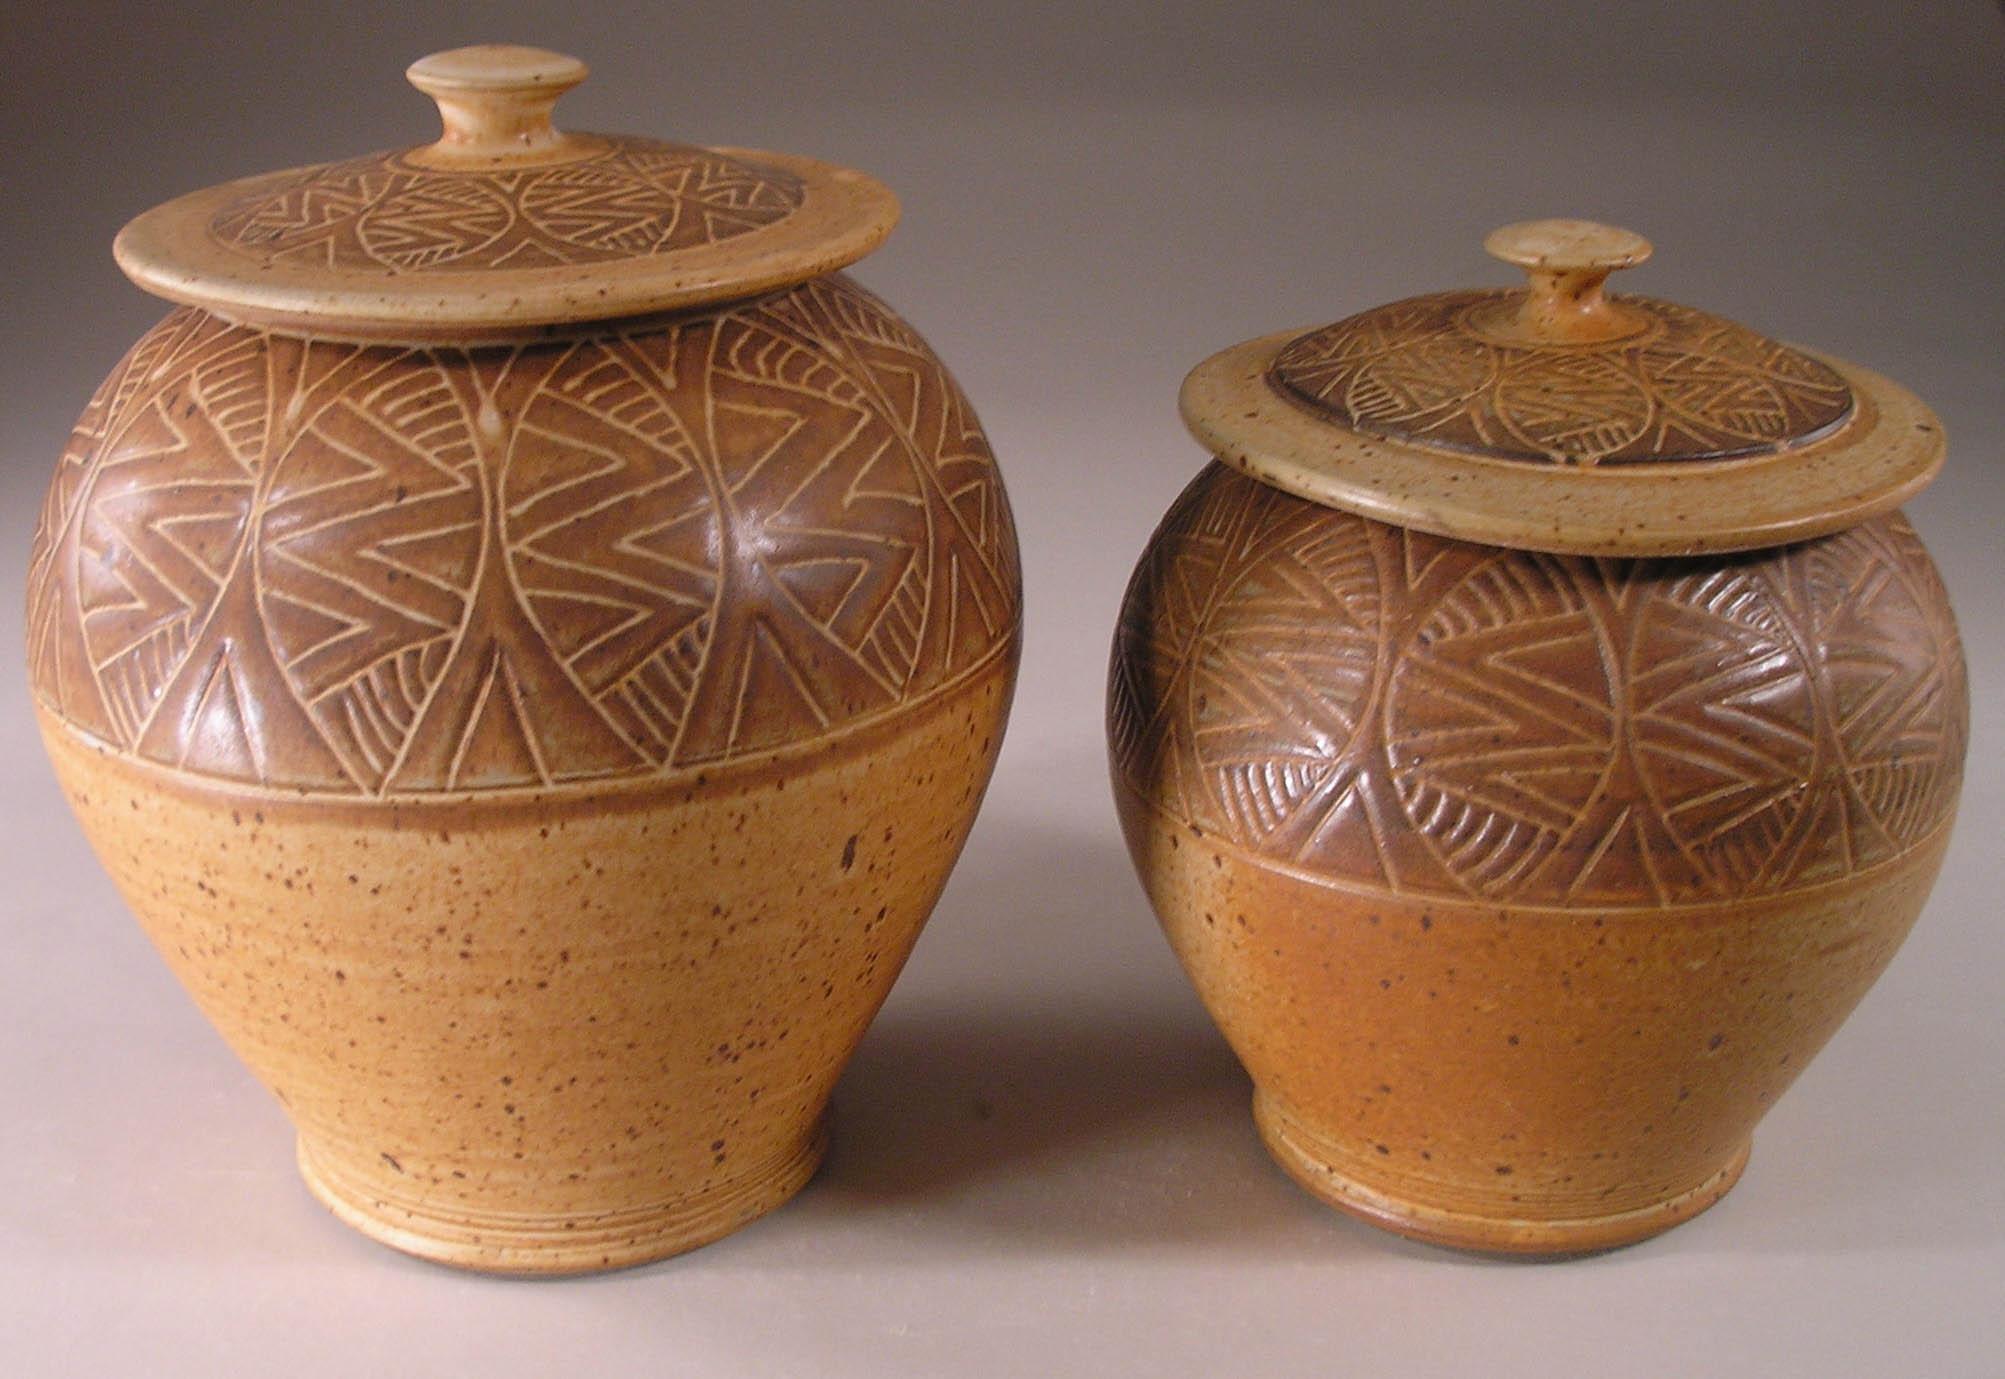 Slip Design Jar, Medium and Small